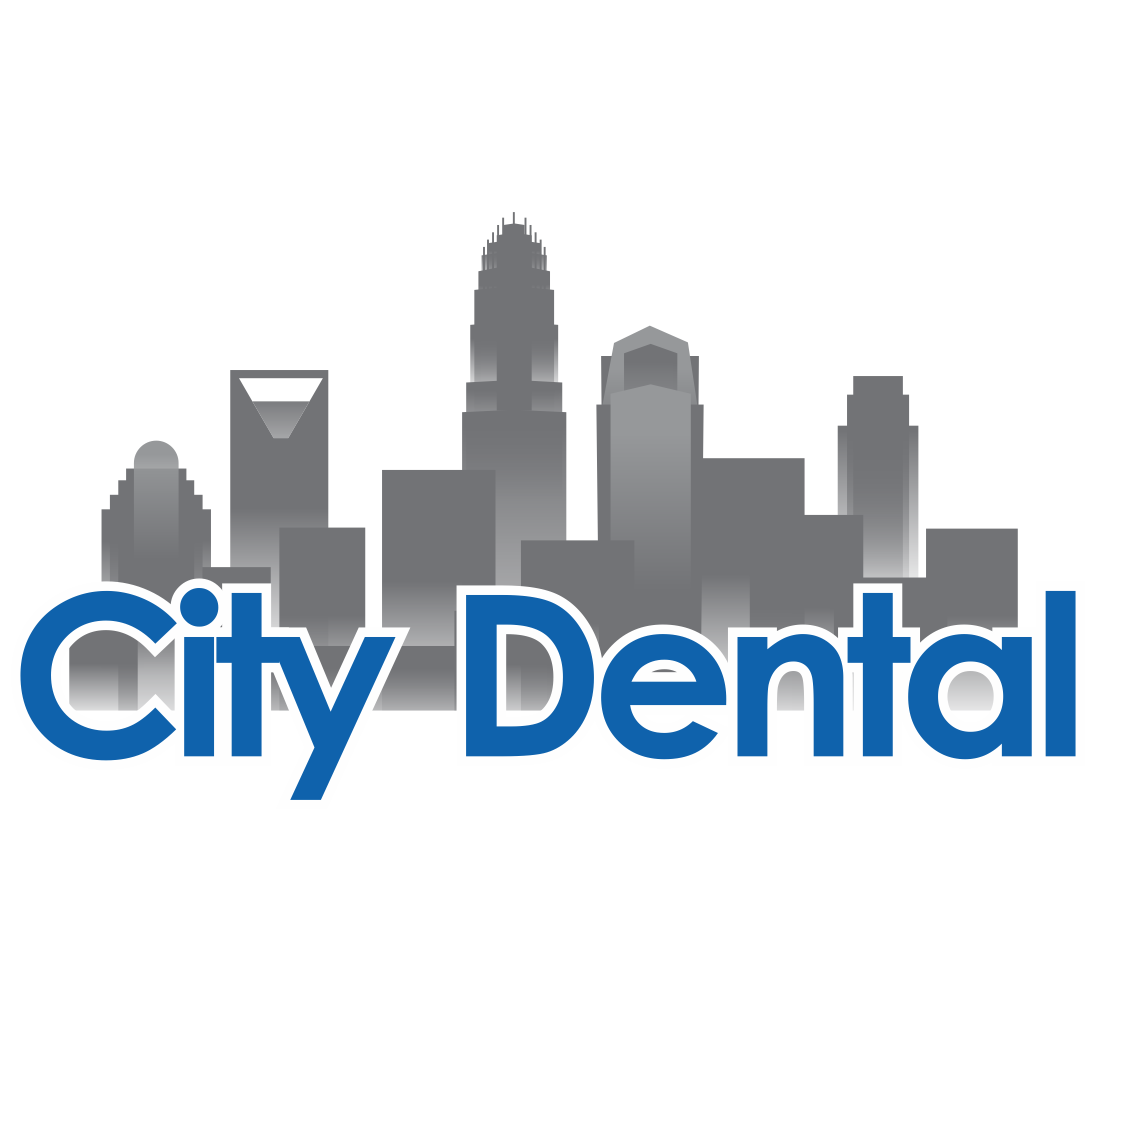 City Dental